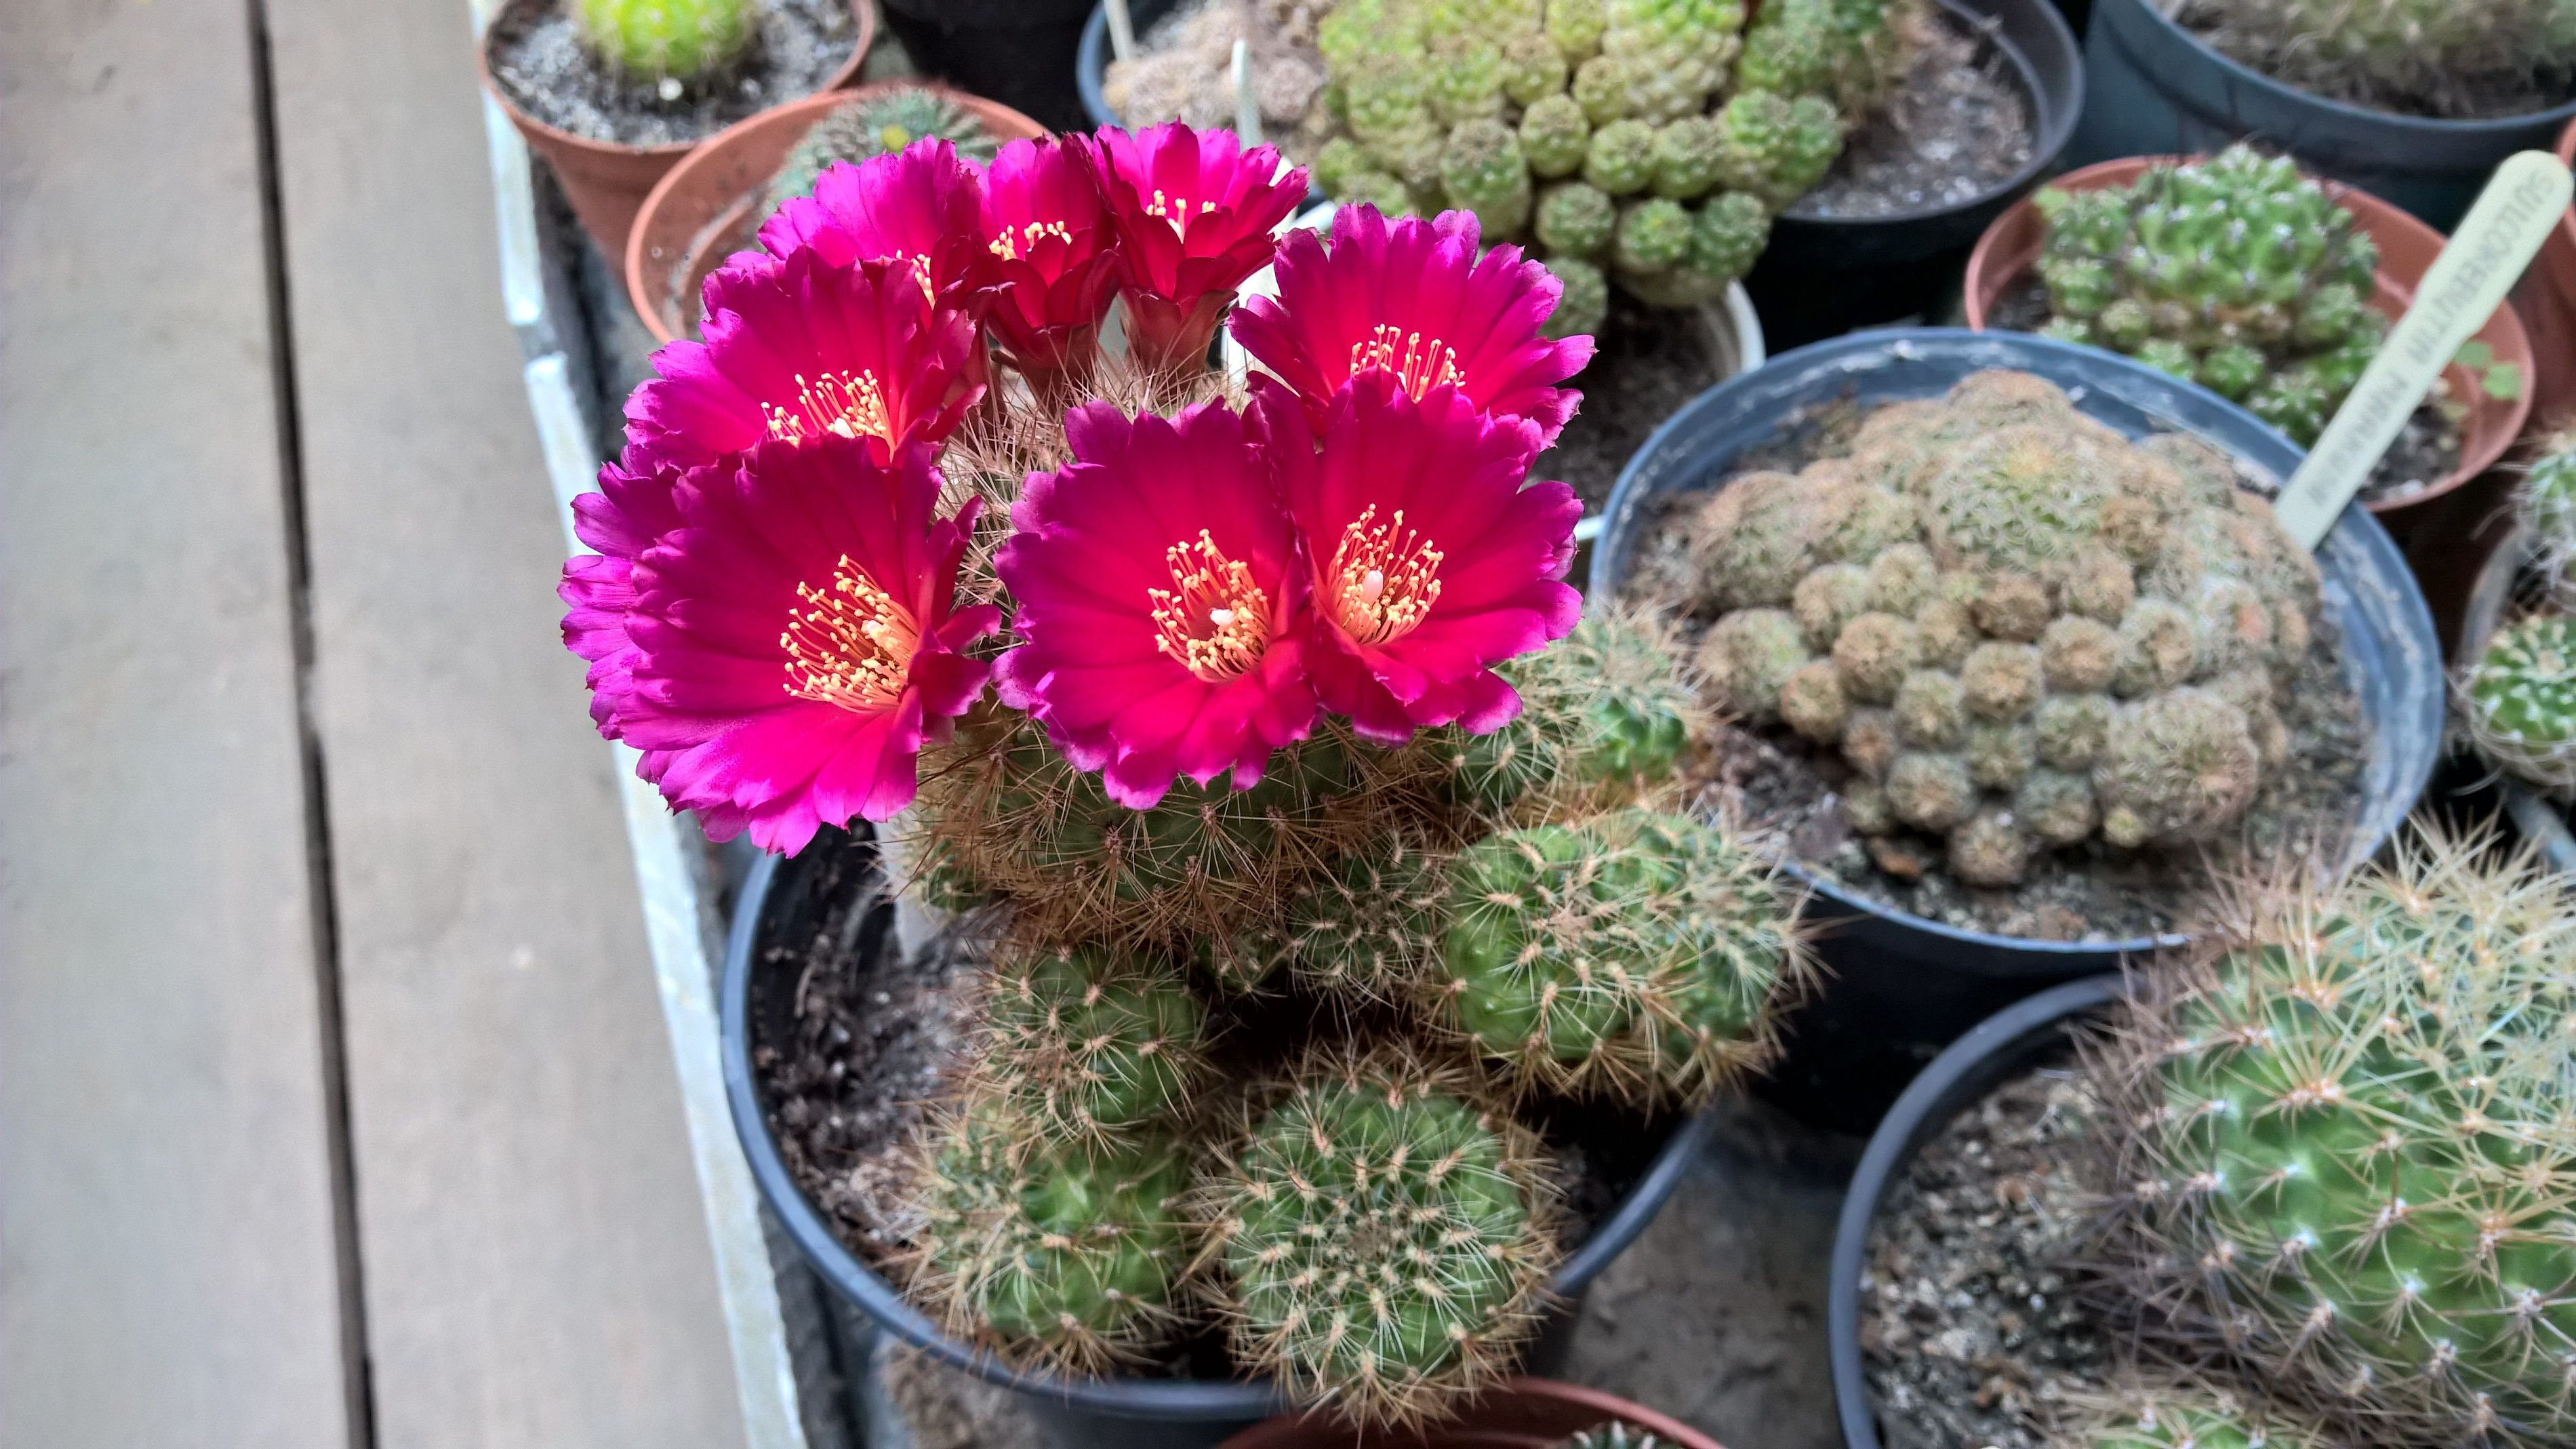 Semis de Sulcorebutia (cactus) 988dfc27460039bfad17bc10805e50ed